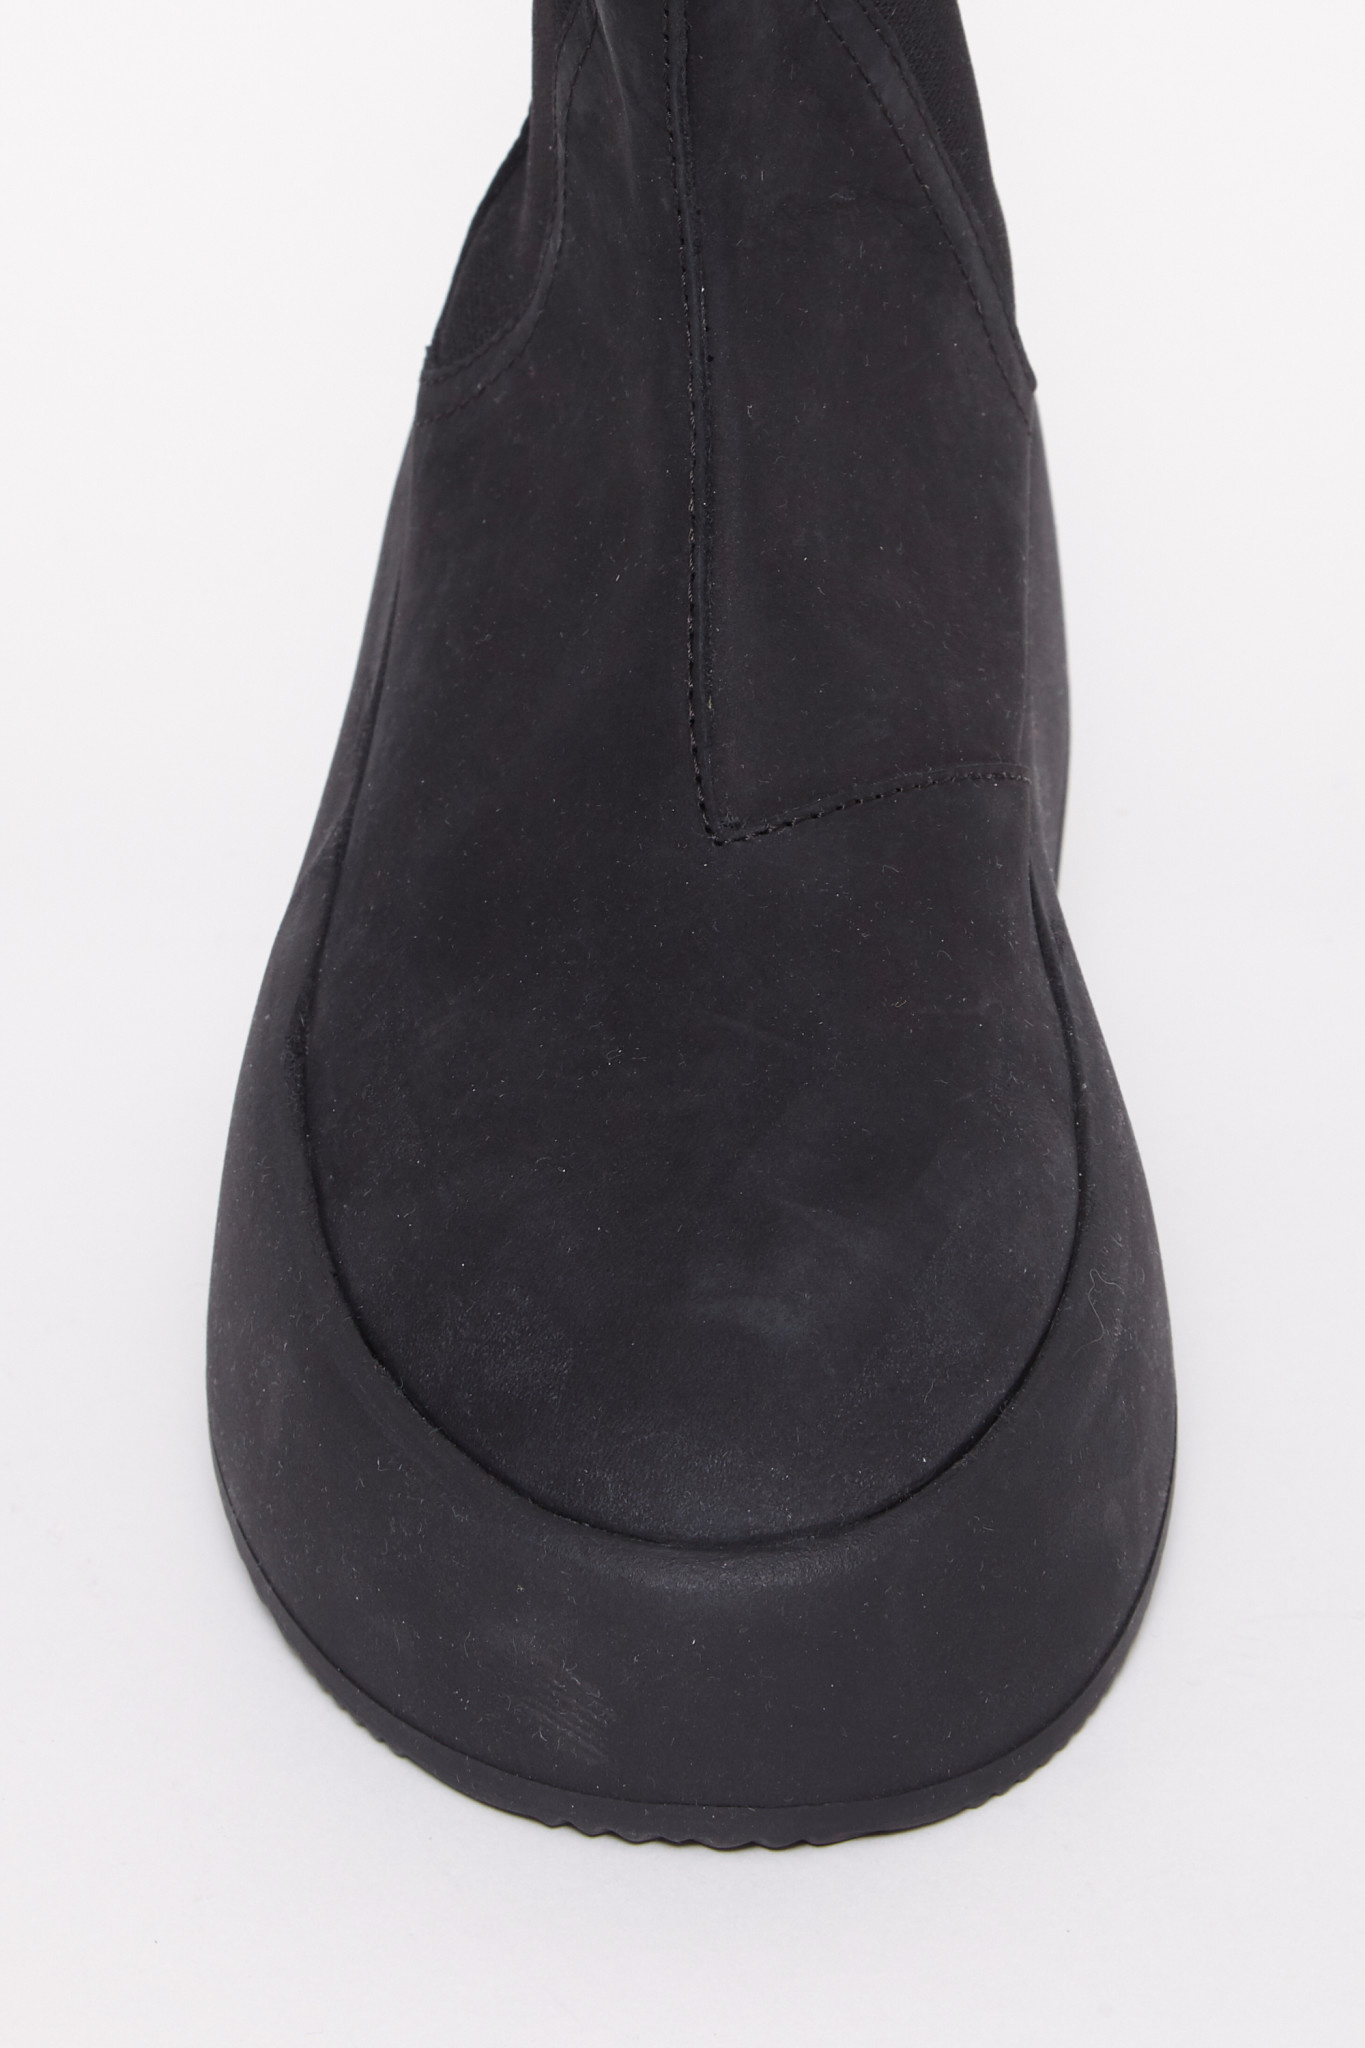 MM6 MAISON MARGIELA  Platform Hightop Sneaker in Black Suede